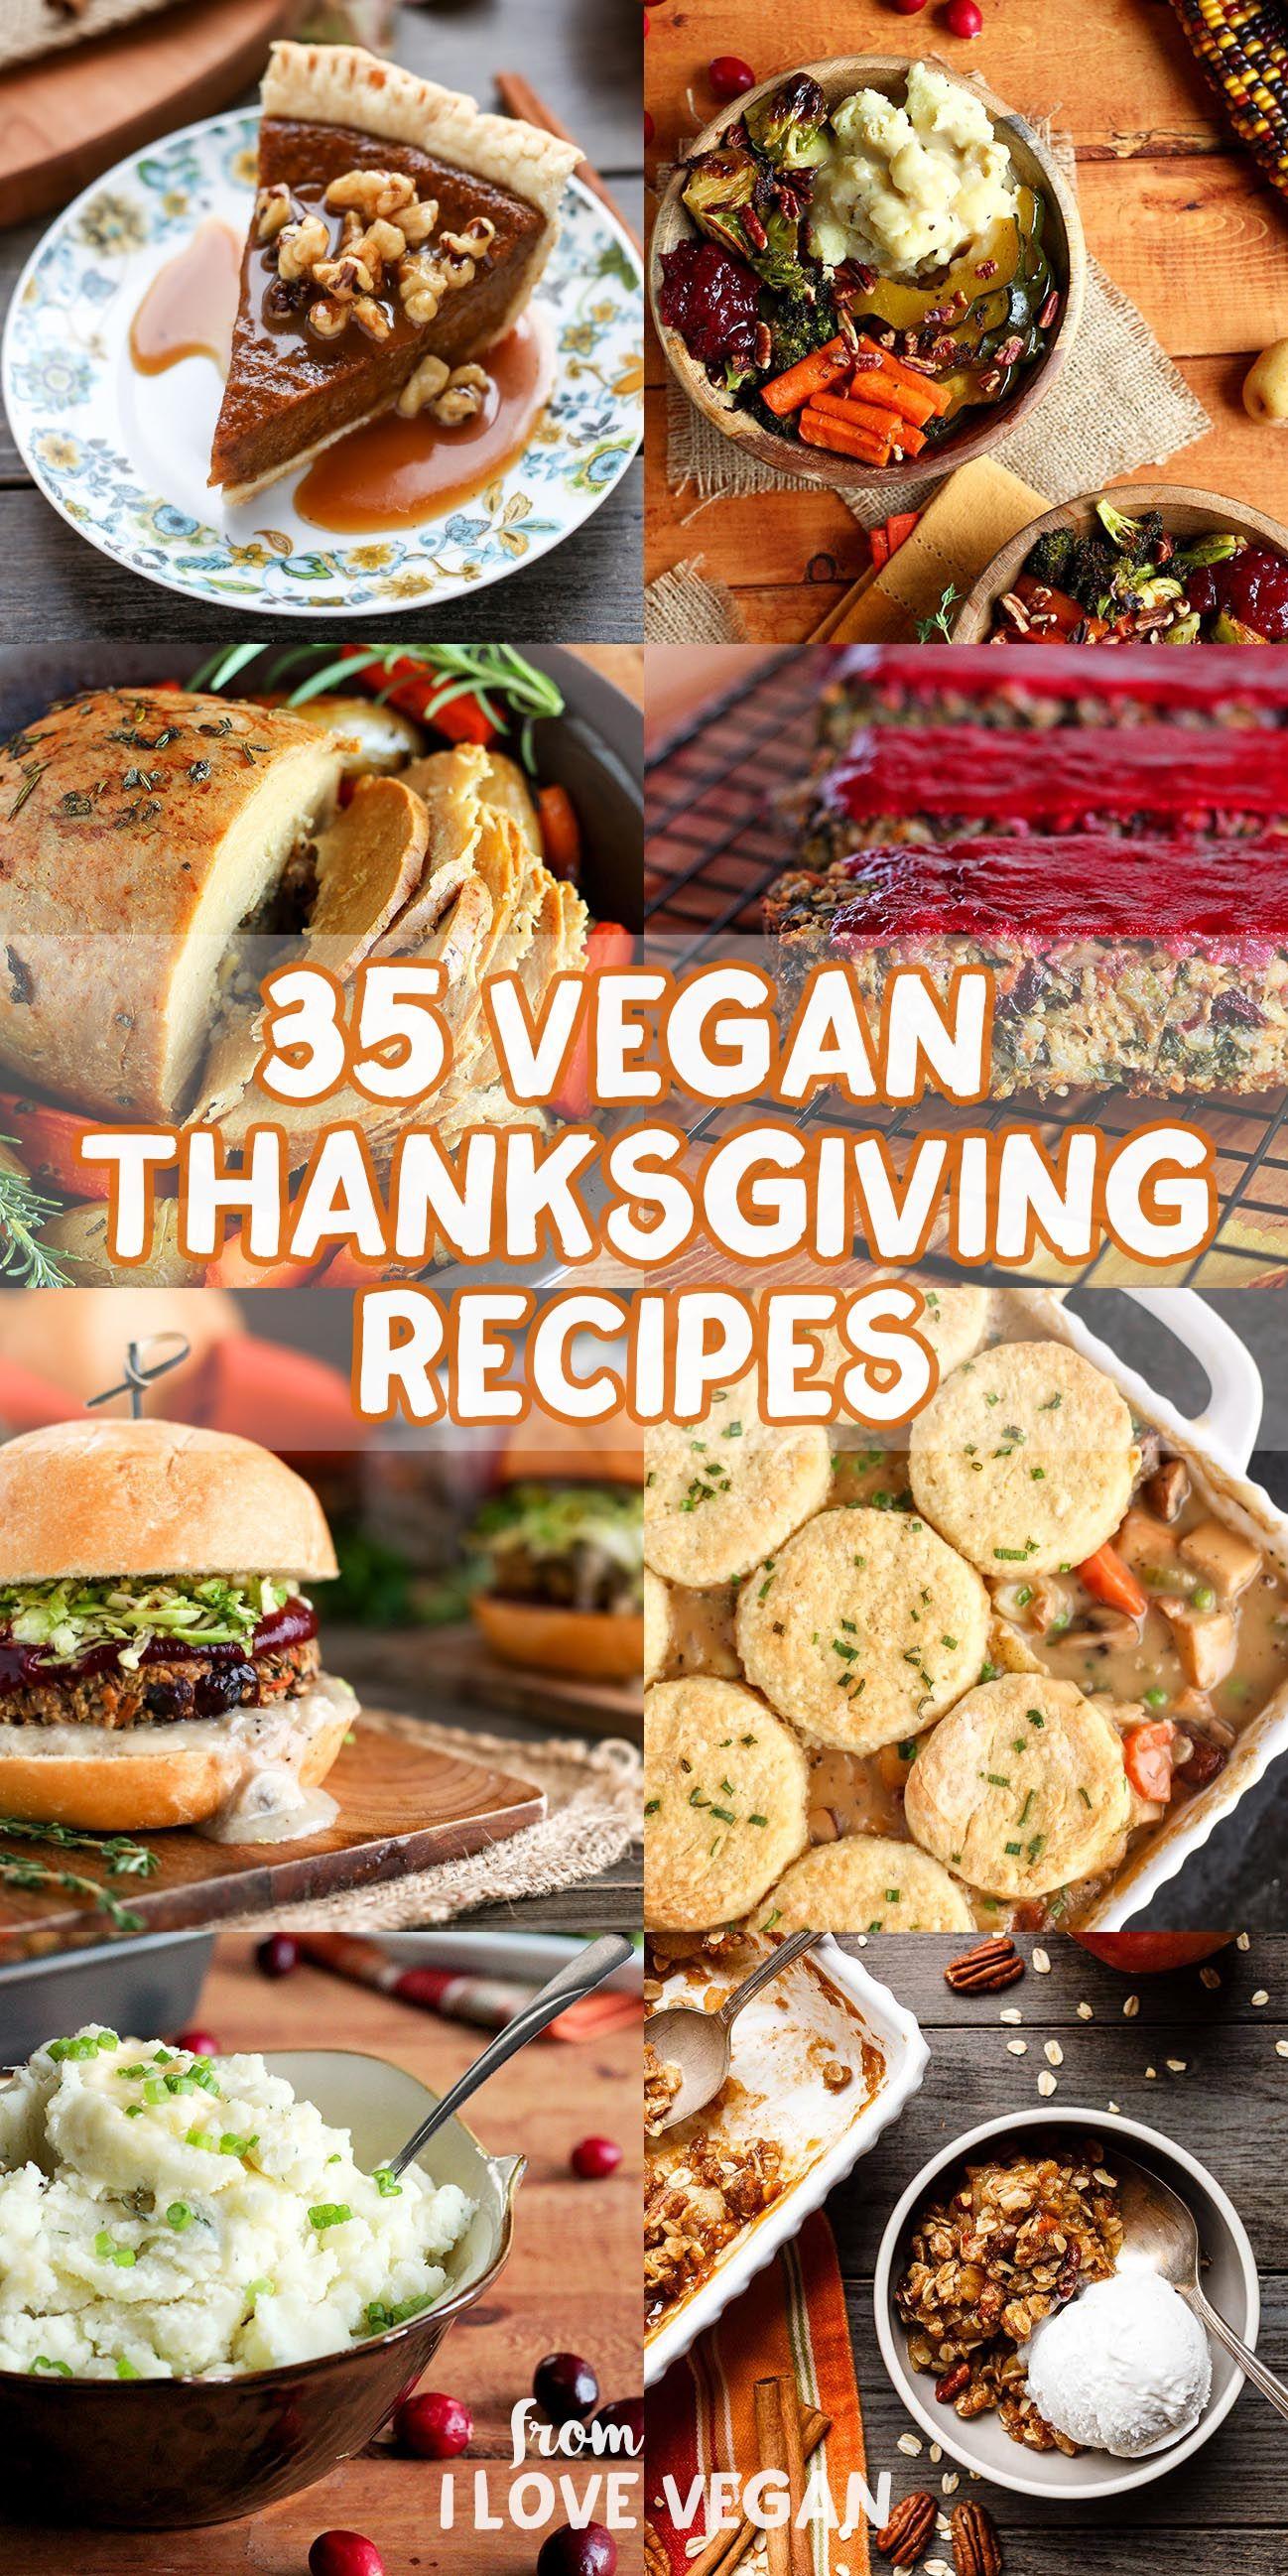 35 Vegan Thanksgiving Recipes Vegan Recipes Pinterest